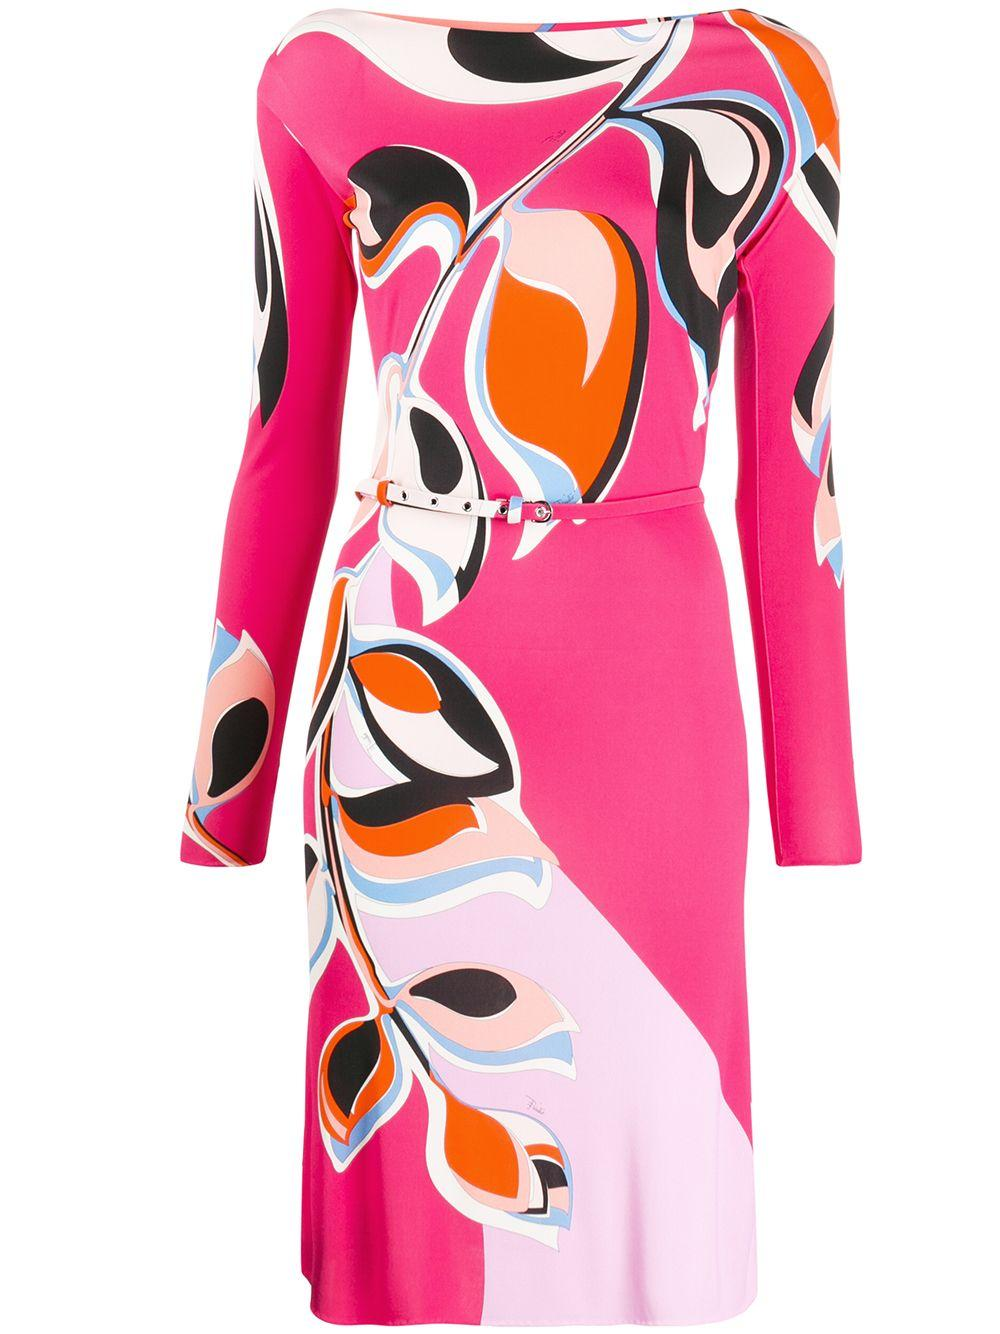 Long Sleeve Printed Dress With Belt